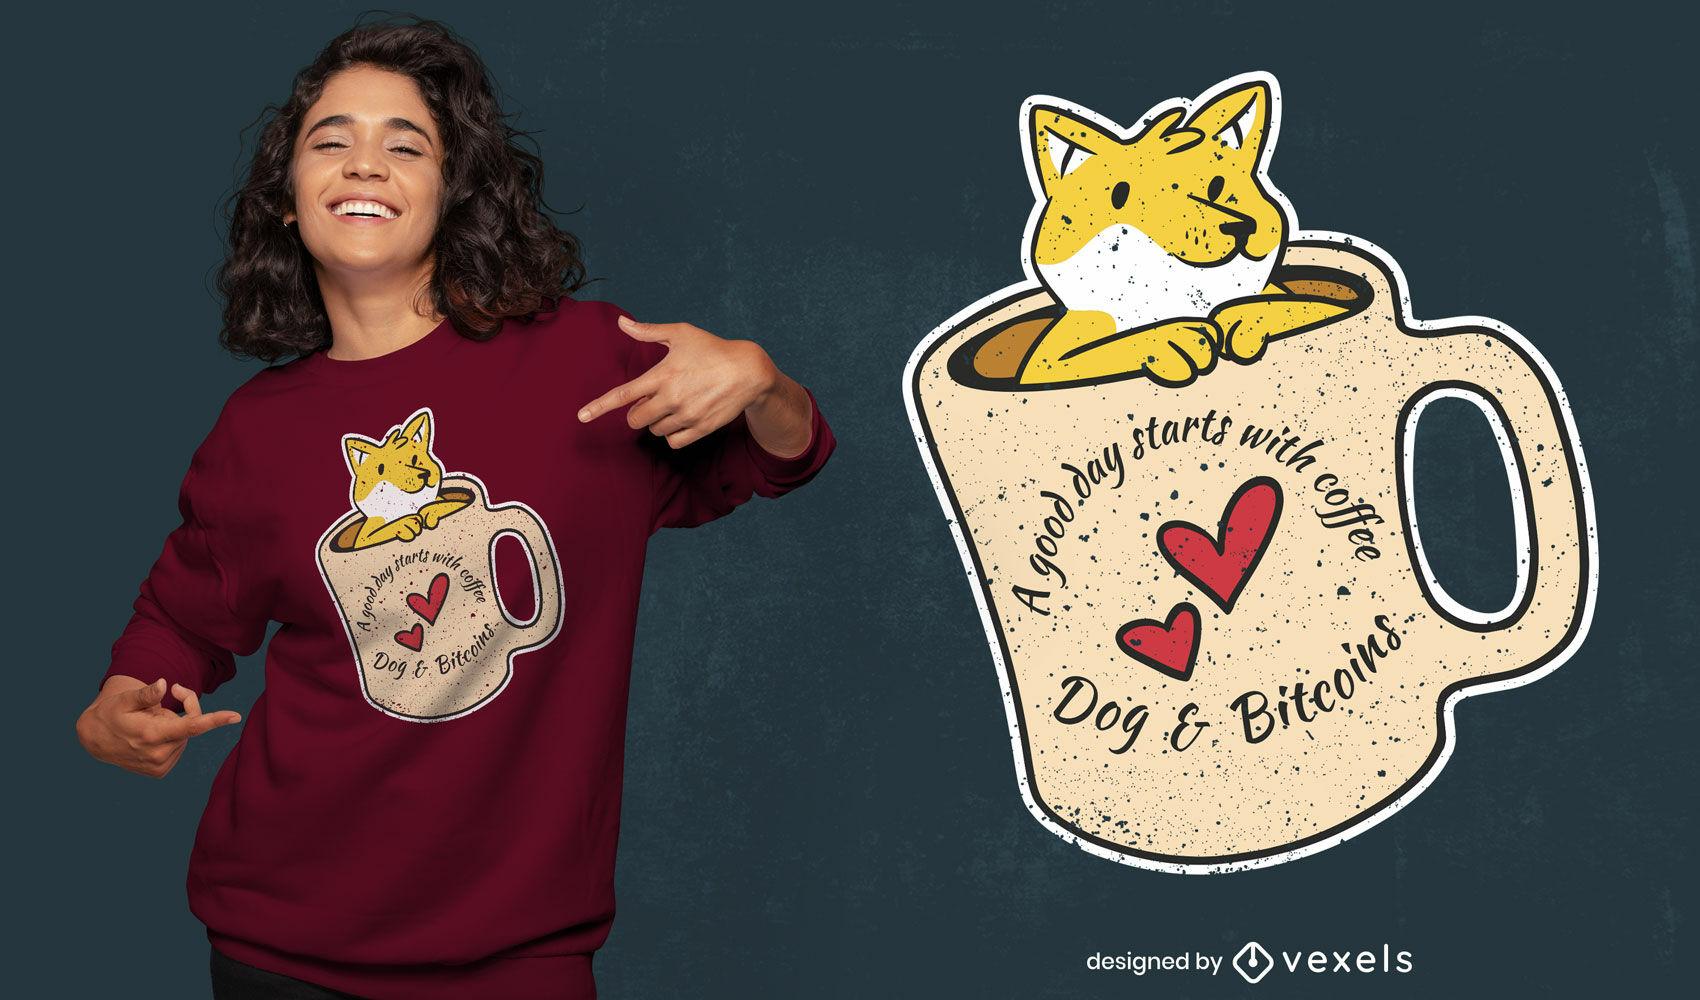 Coffee Dog and Bitcoins t-shirt design